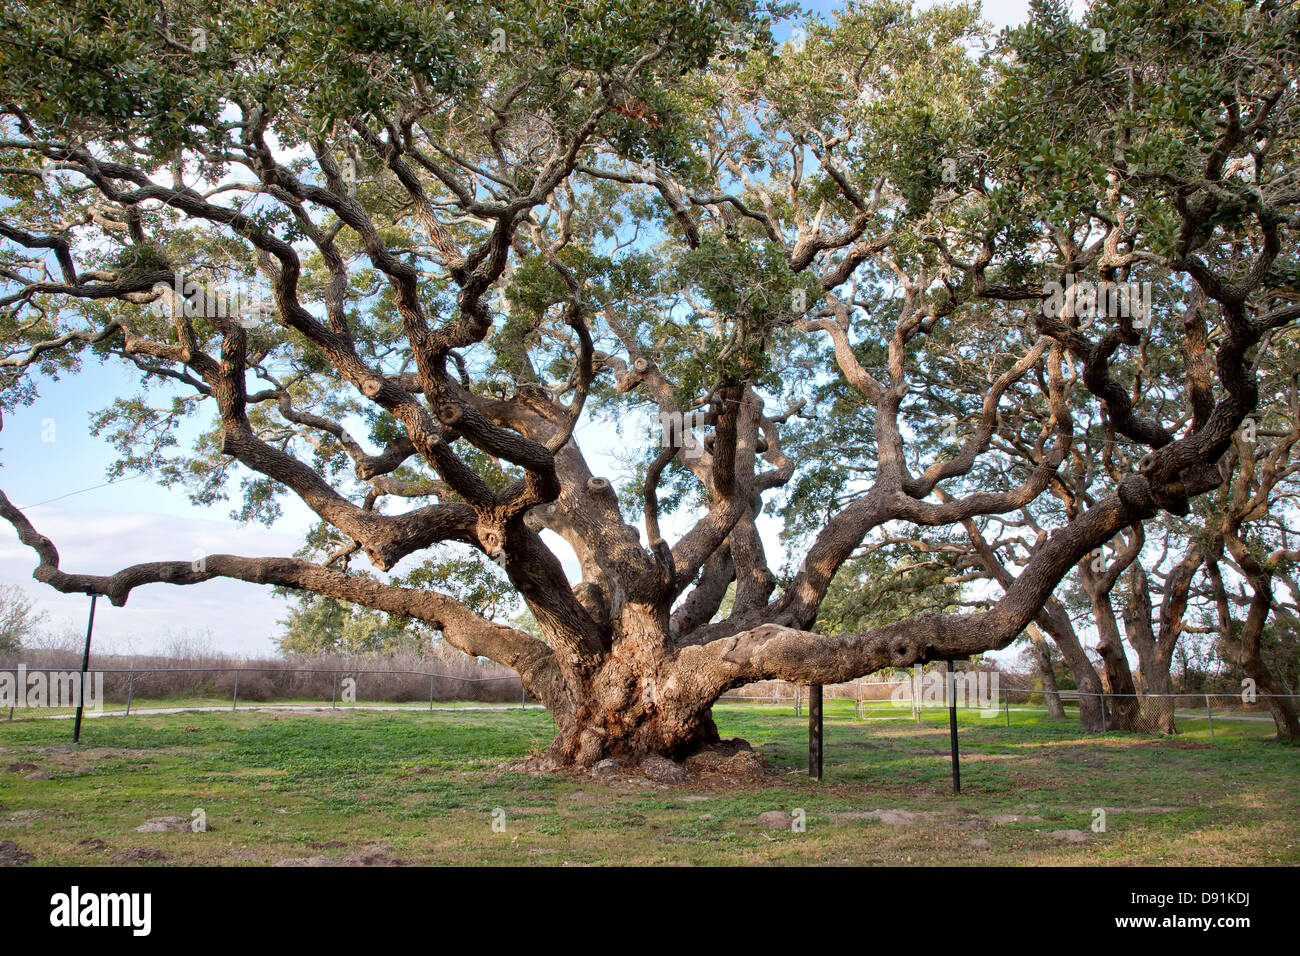 Big Tree, Southern Live Oak tree. - Stock Image